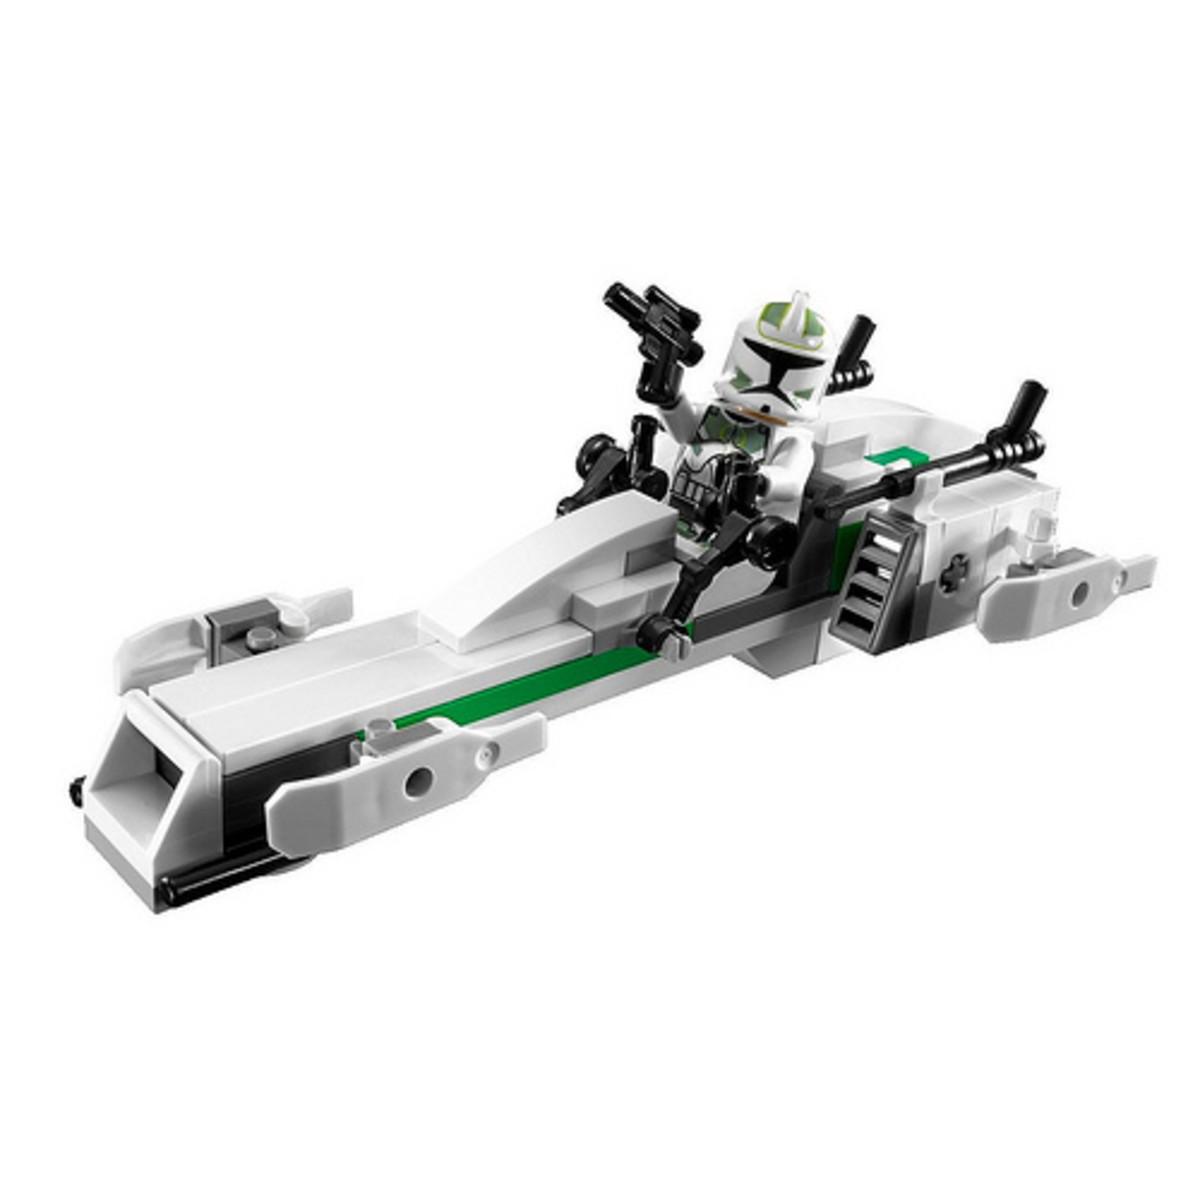 LEGO Star Wars Clone Trooper Battle Pack 7913 Assembled